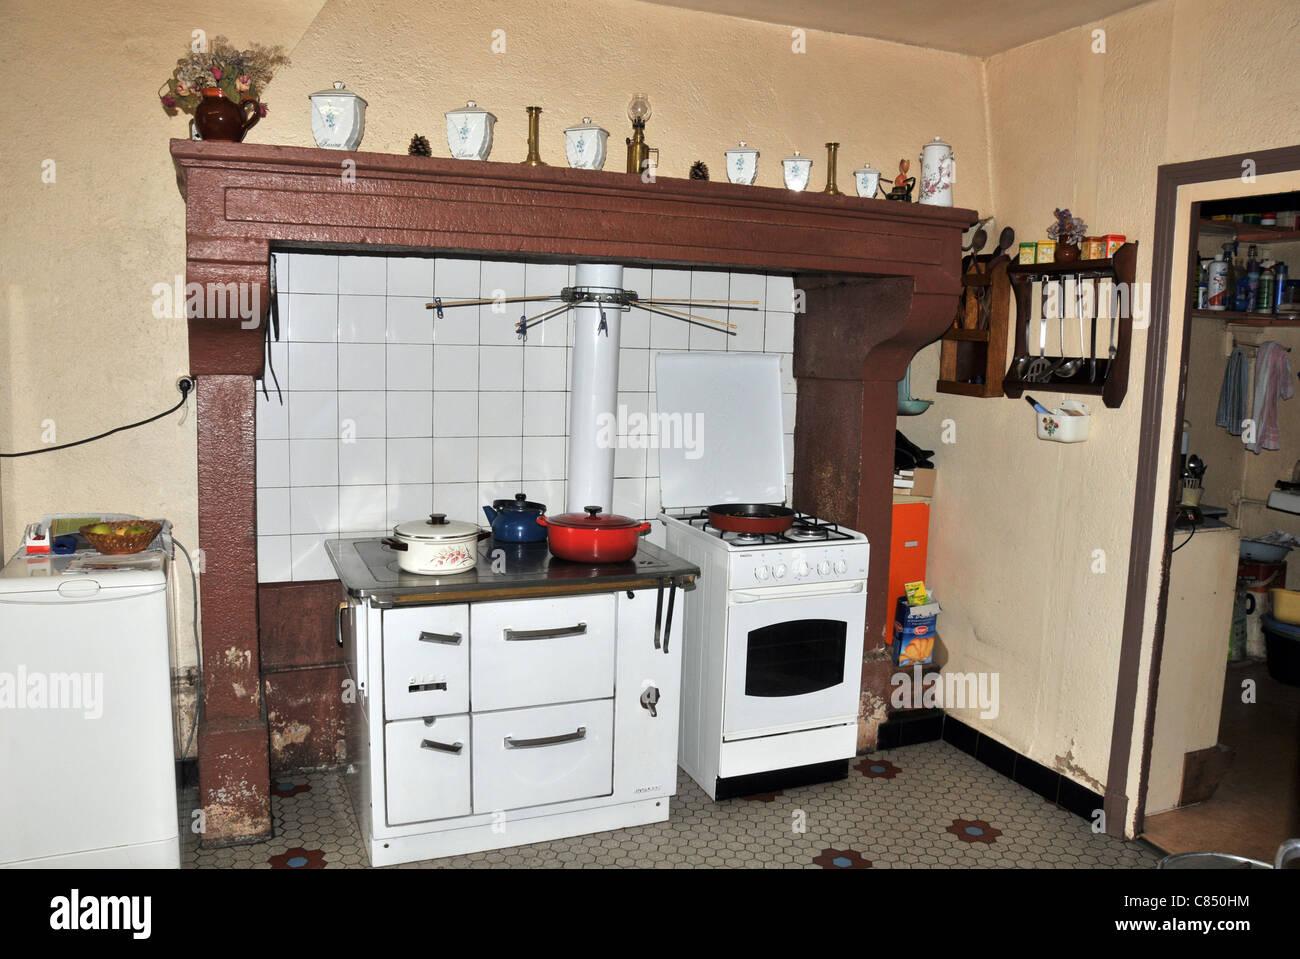 Chemin e Cuisine Ancienne | Salon Avec Cheminee Ancienne